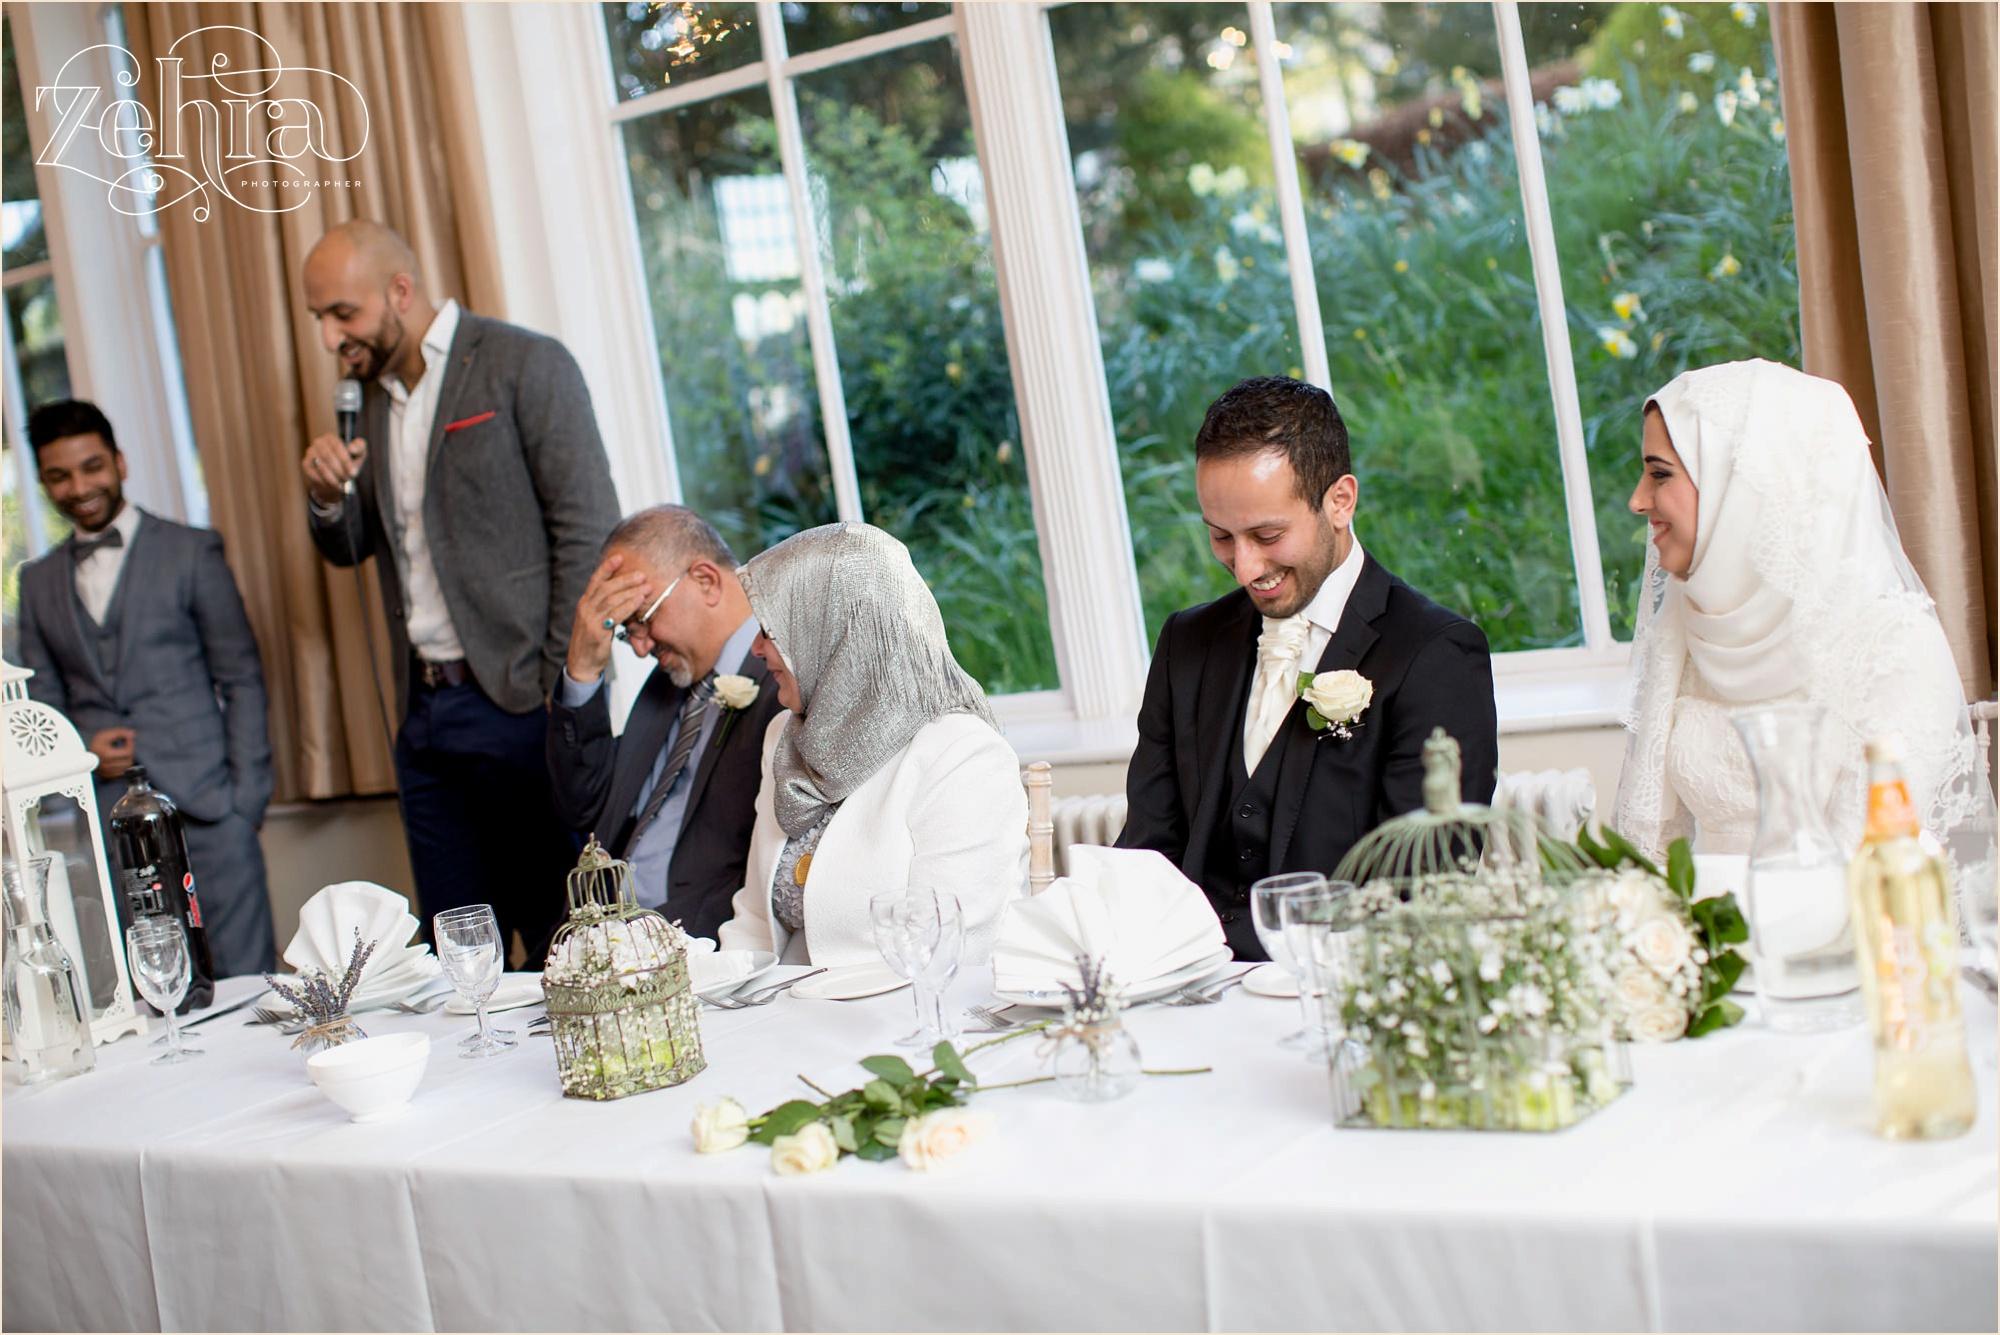 jasira manchester wedding photographer_0110.jpg